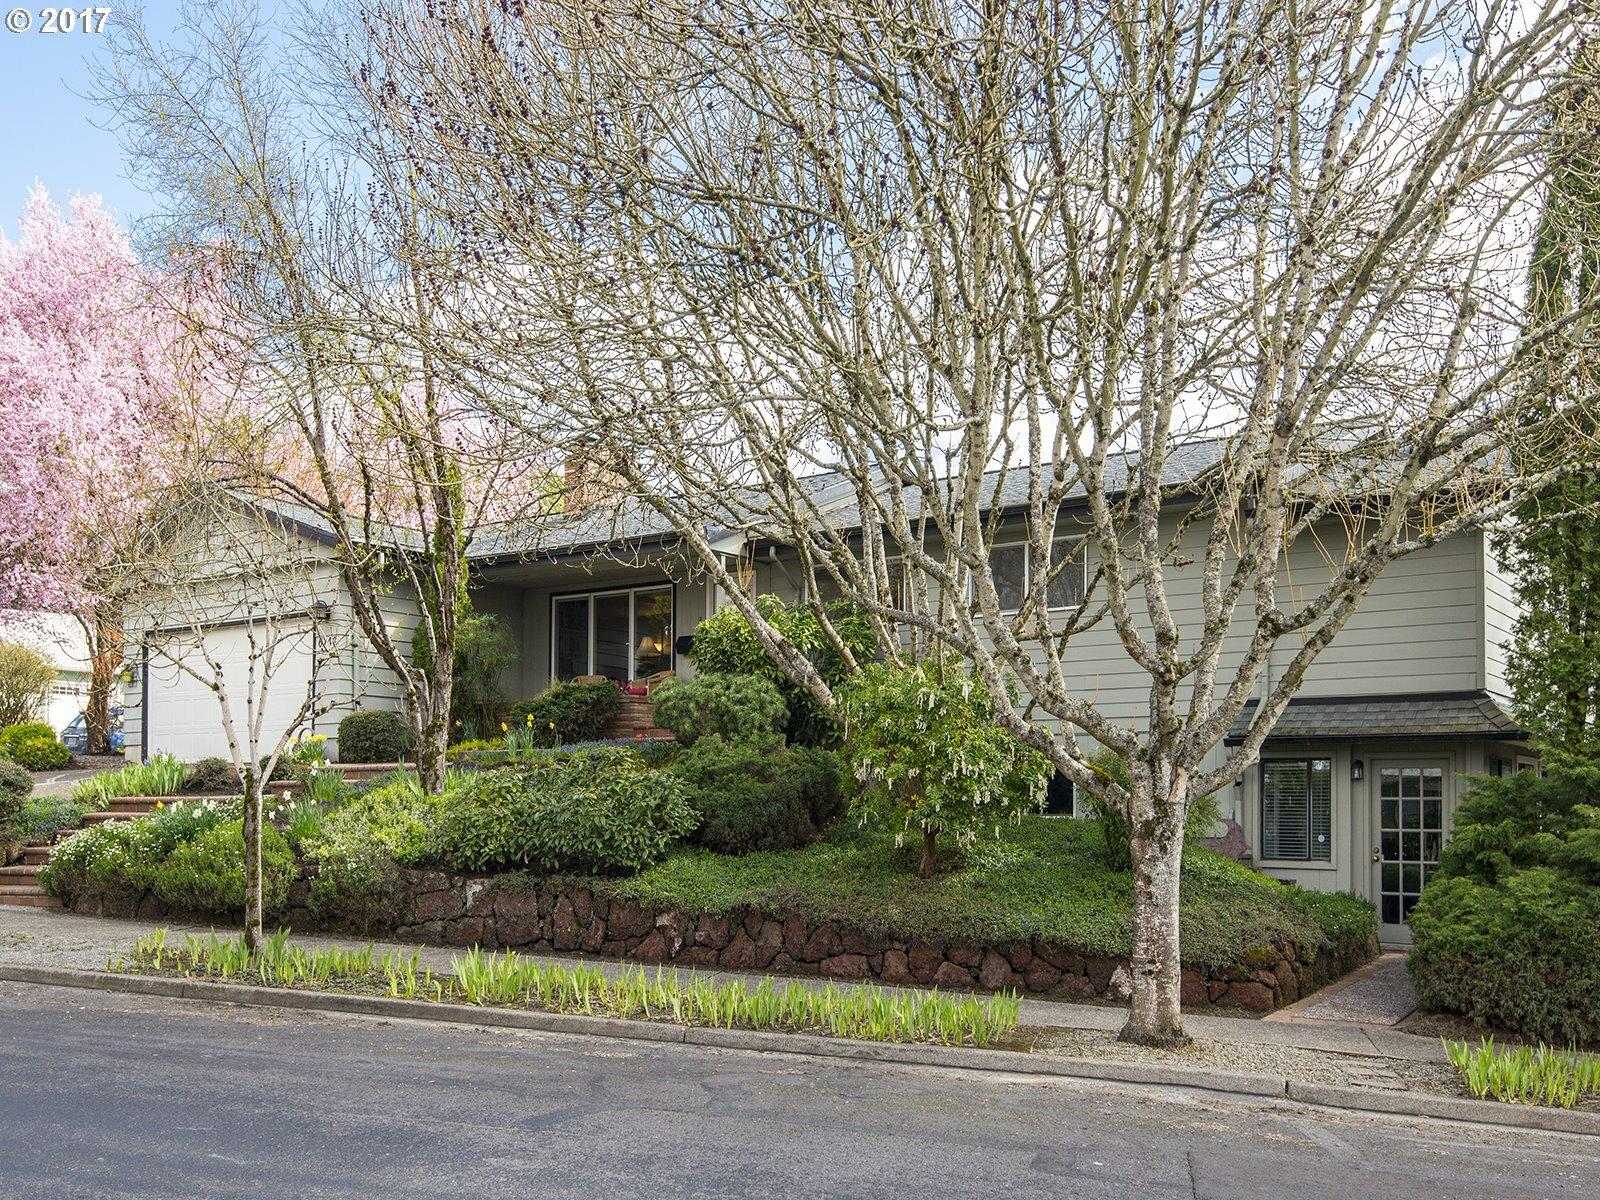 6740 Sw 12th Ave, Portland, OR - USA (photo 1)